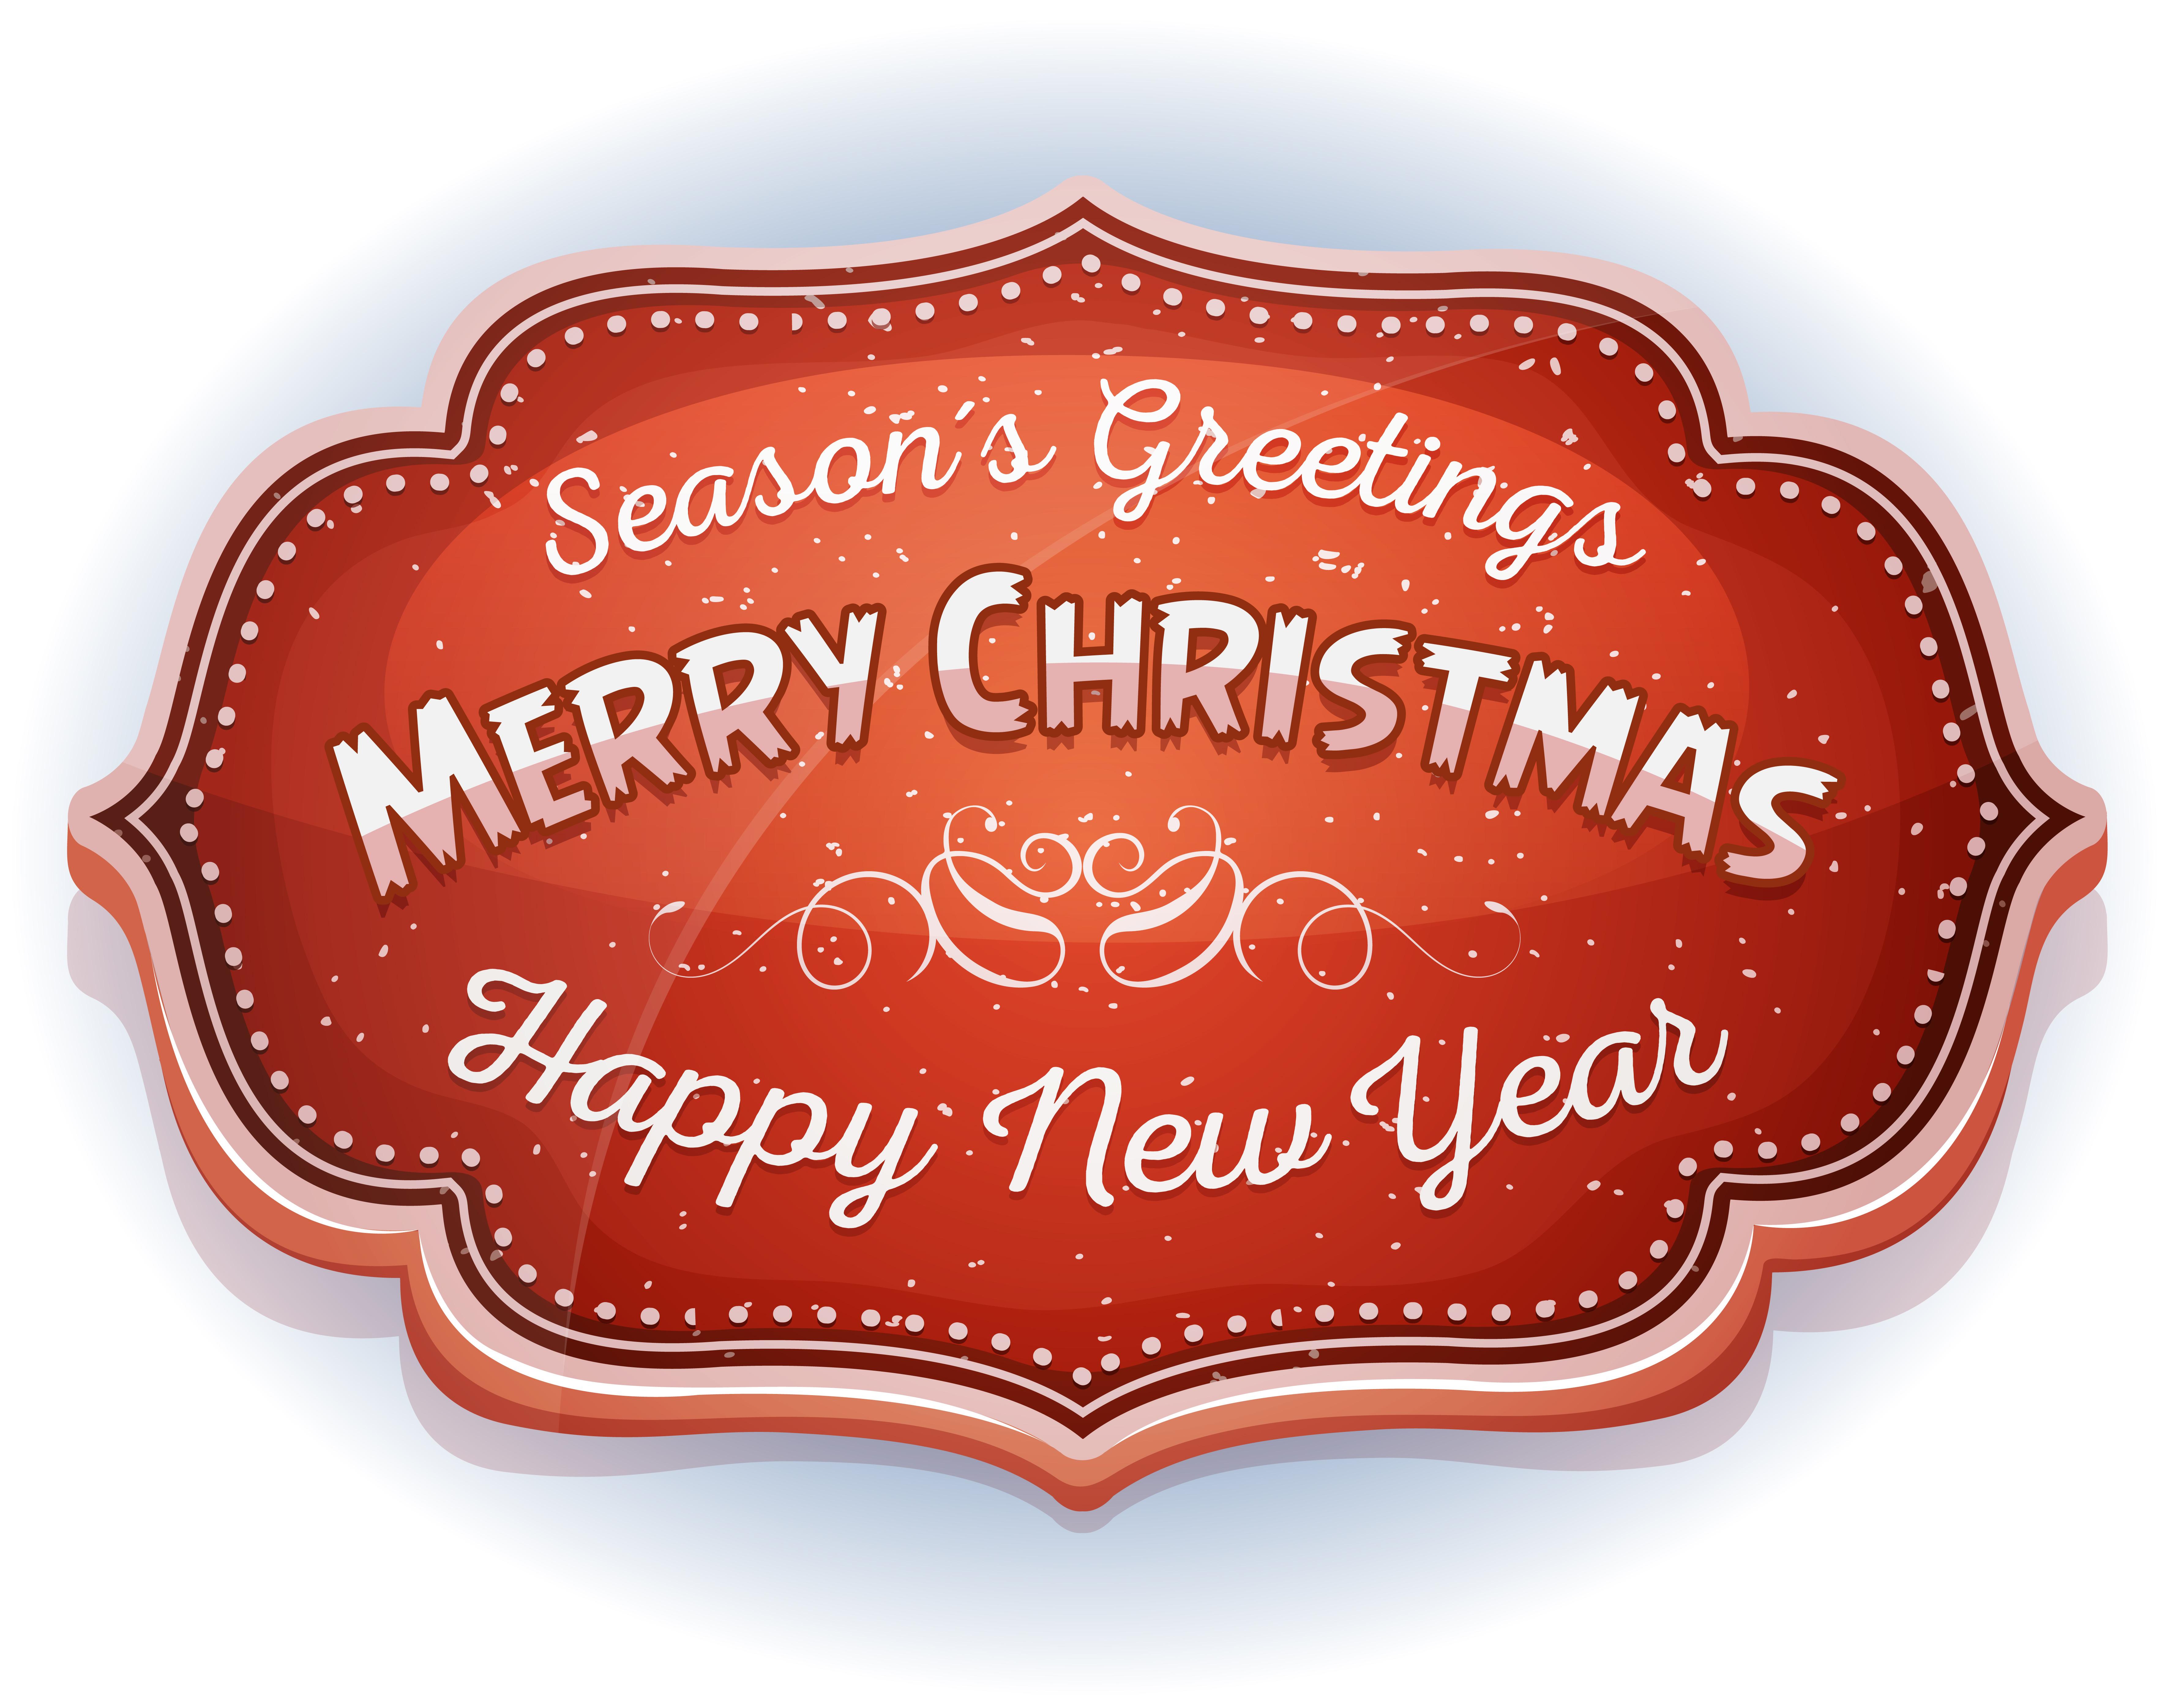 Happy New Year And Season's Greetings